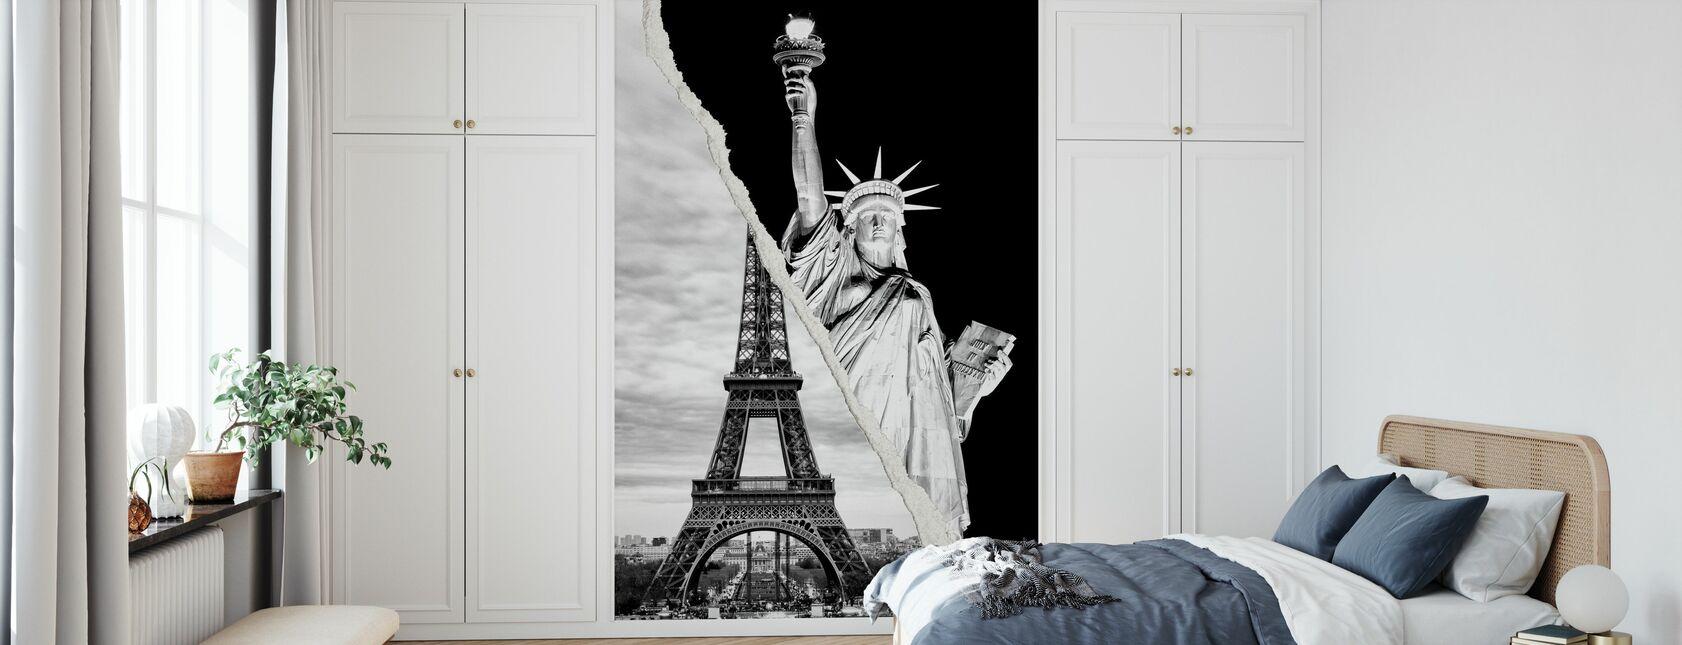 Dual Torn Posters - Famous - Wallpaper - Bedroom